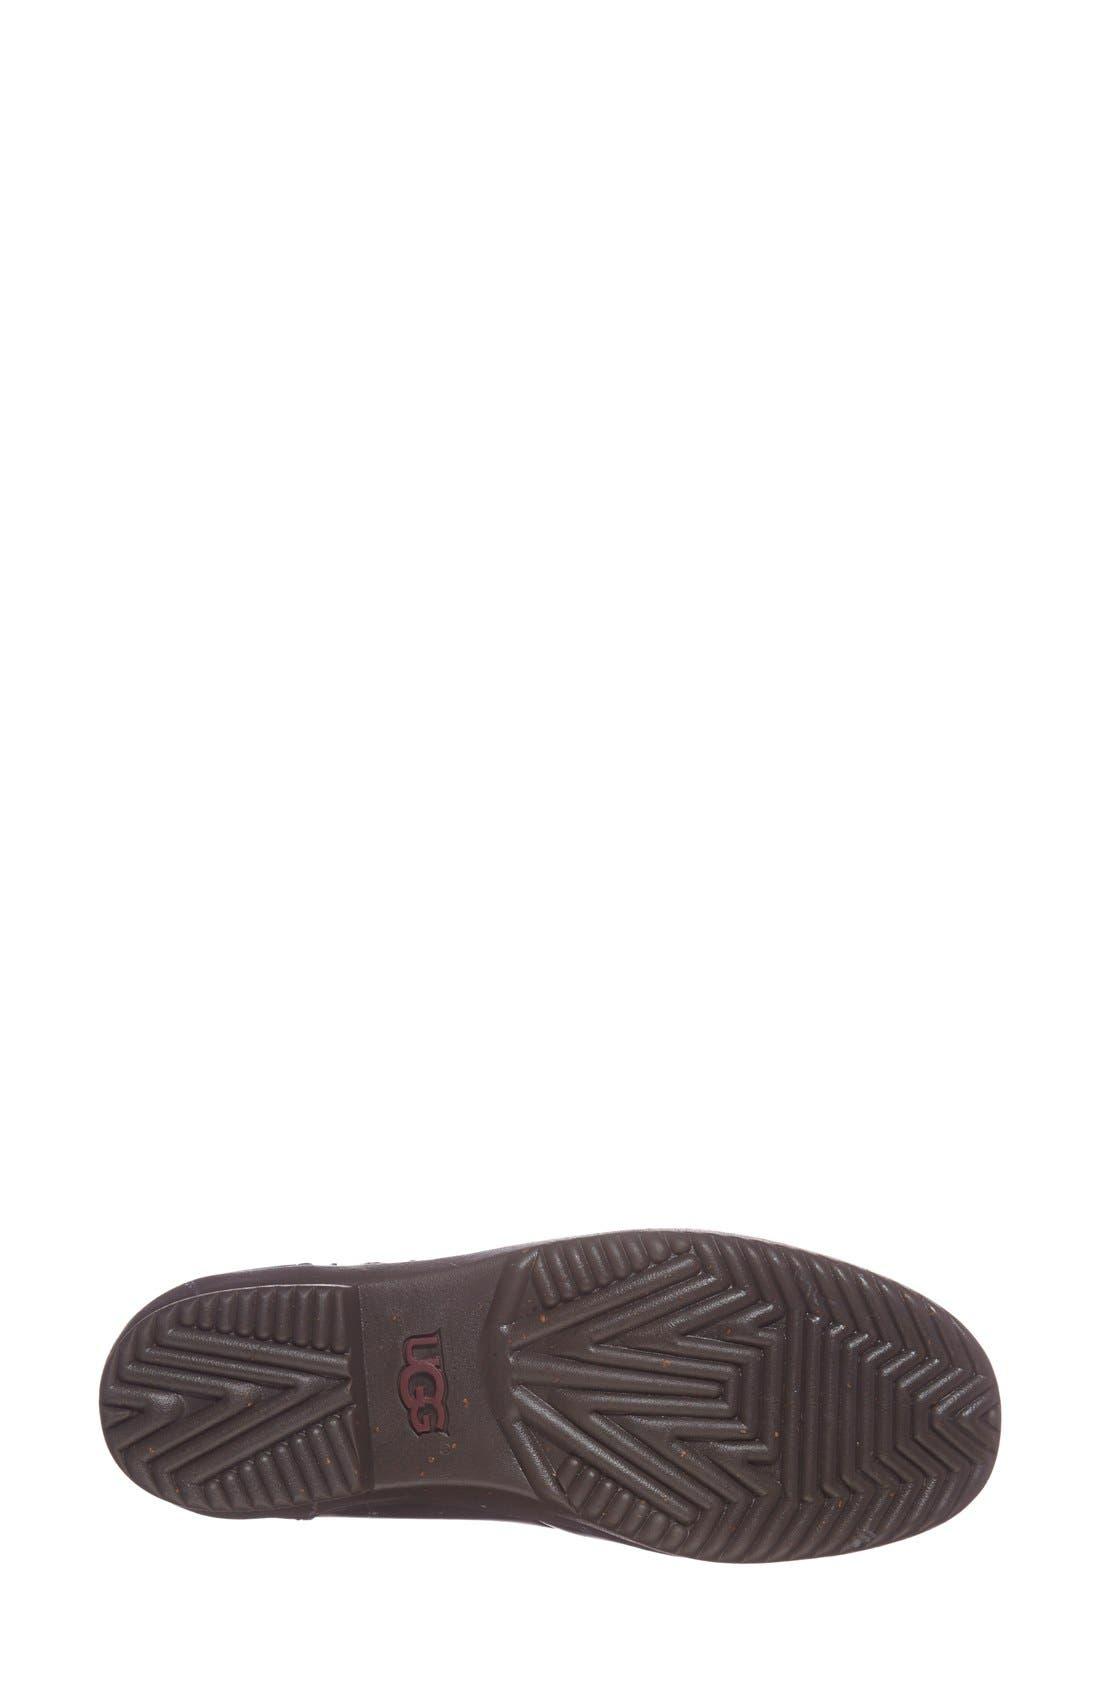 UGG<SUP>®</SUP>, Kesey Waterproof Boot, Alternate thumbnail 2, color, BLACK